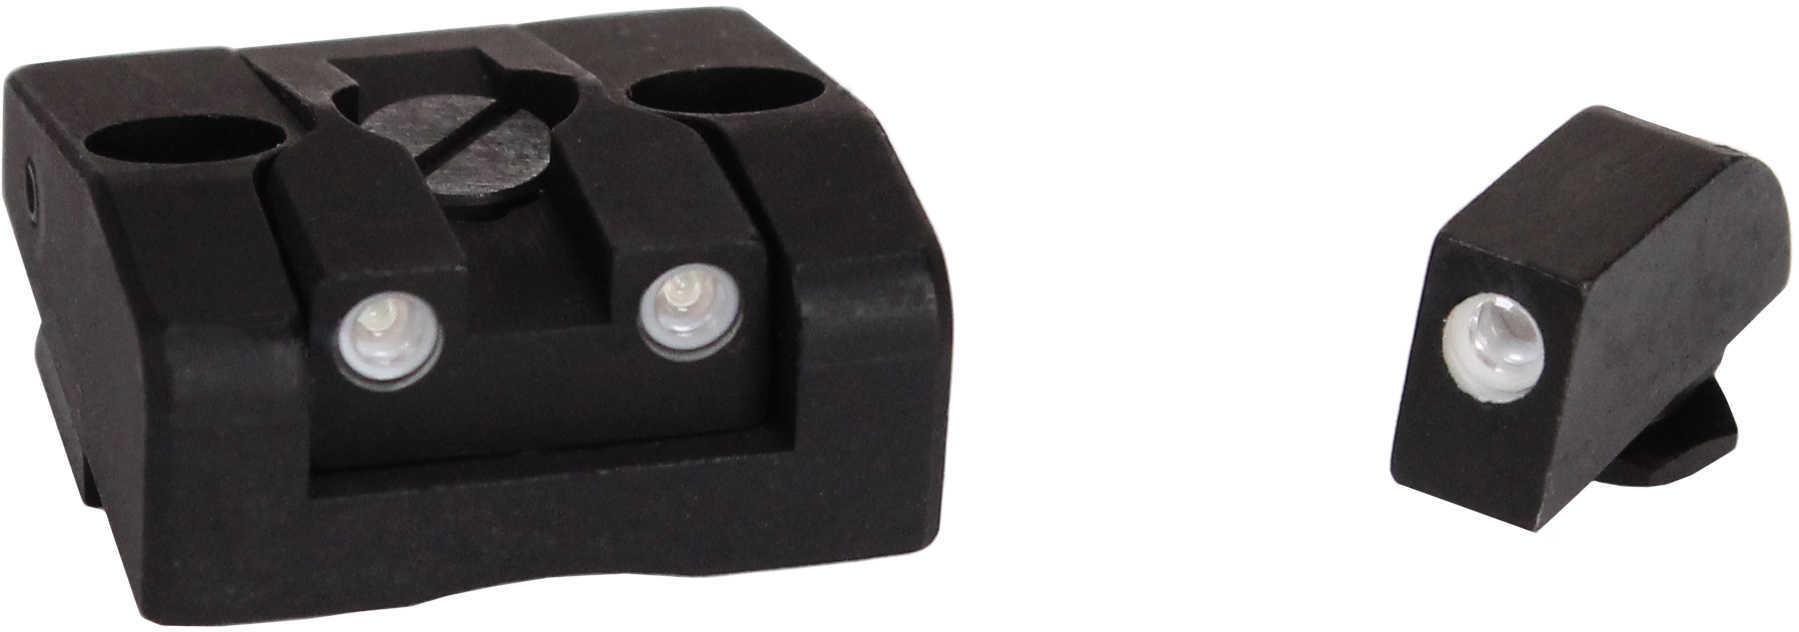 Mako Group for Glock Tru-Dot Night Sight 26/27 Adjustable Set, Green